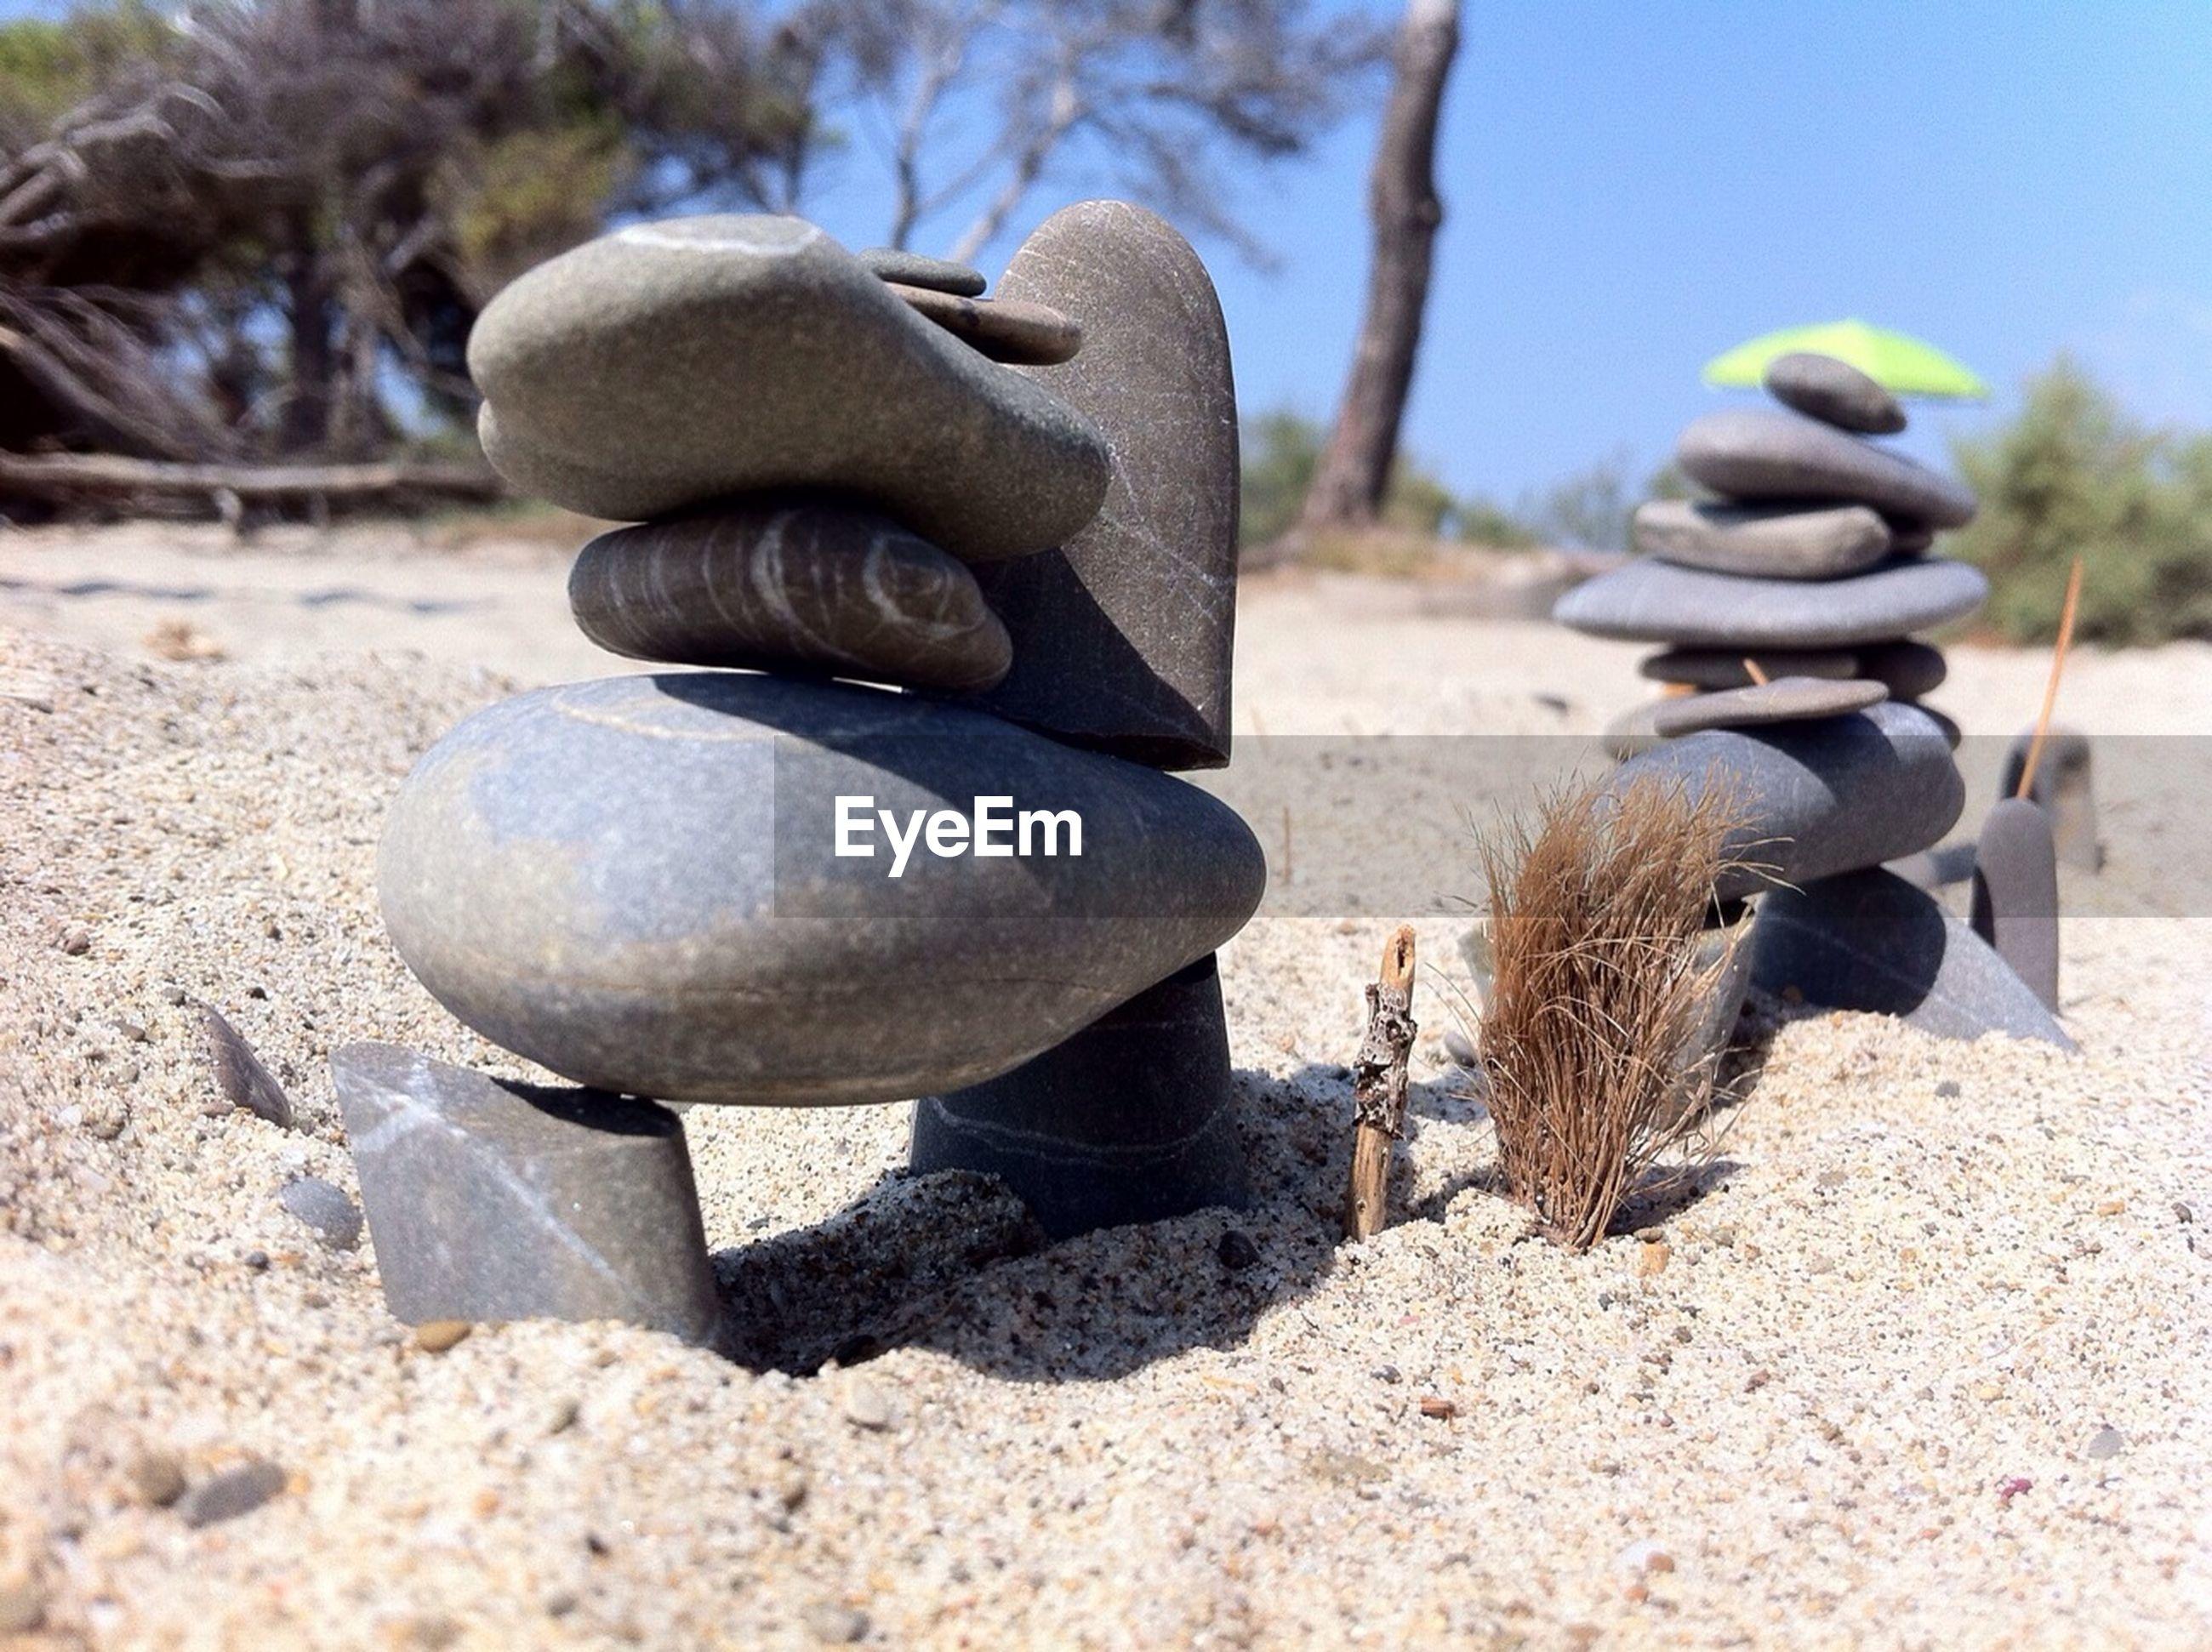 Stacks of pebbles at sandy beach